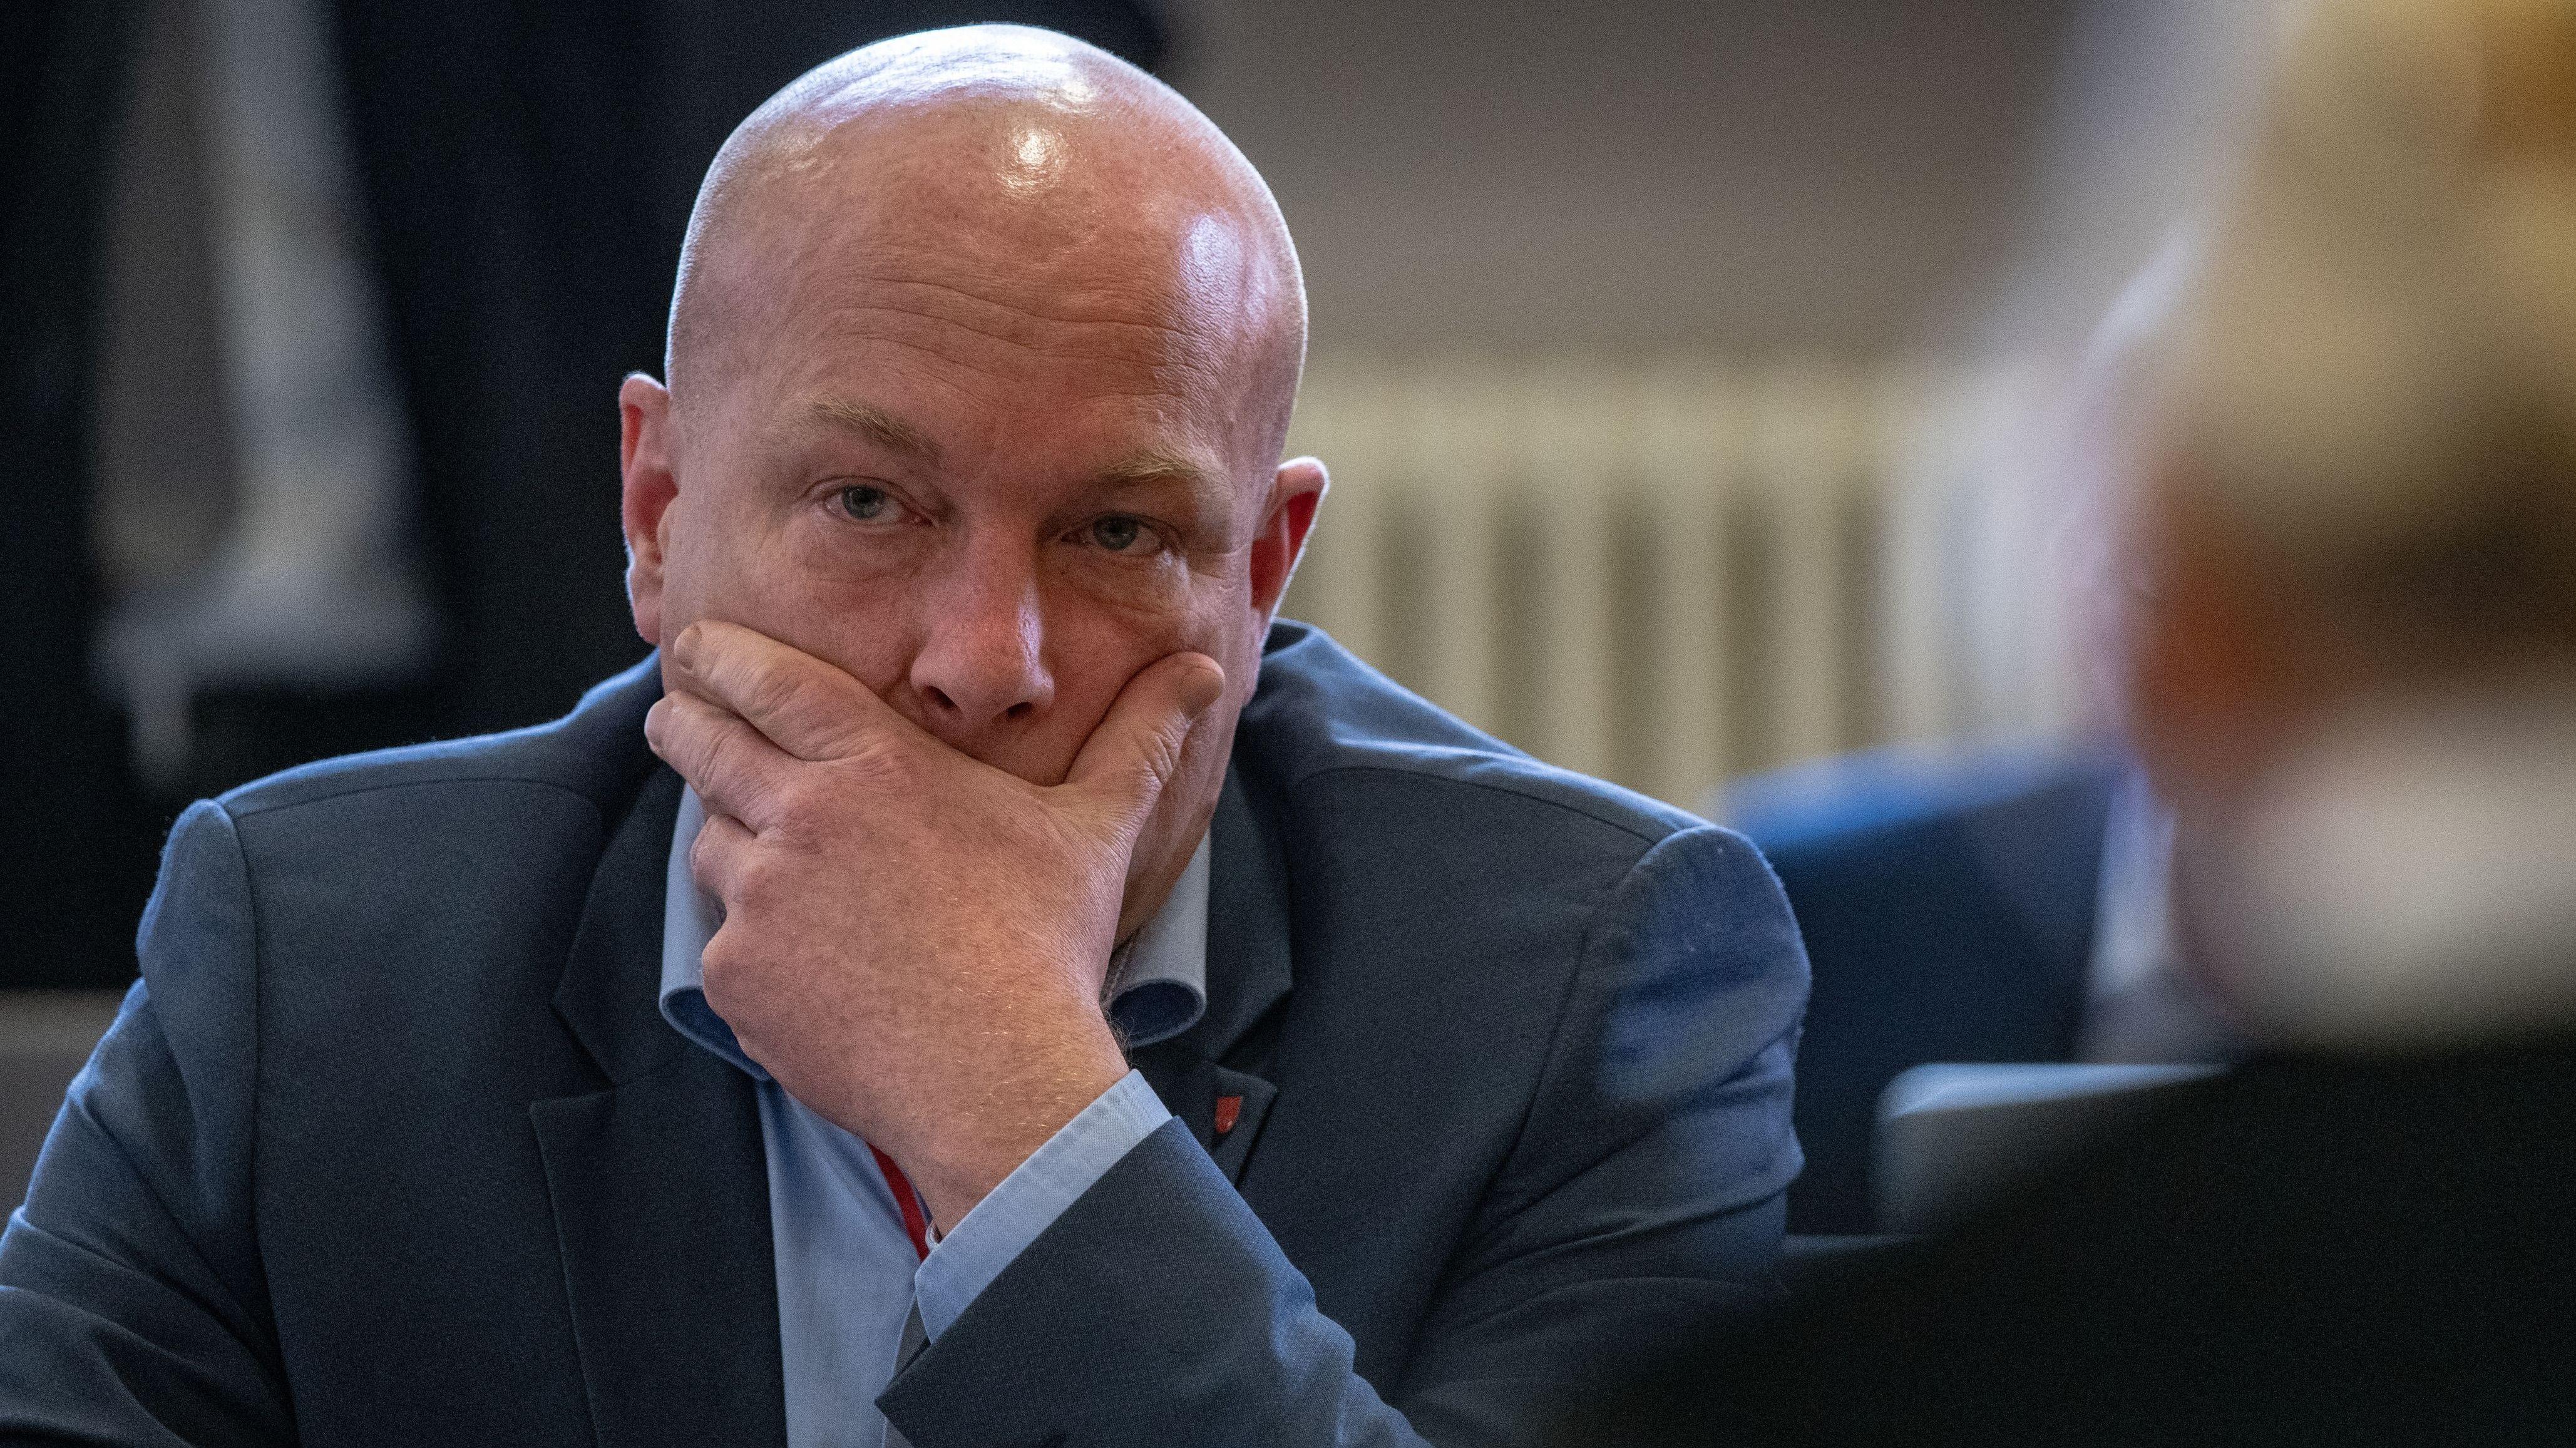 Der suspendierte Regensburger OB Joachim Wolbergs